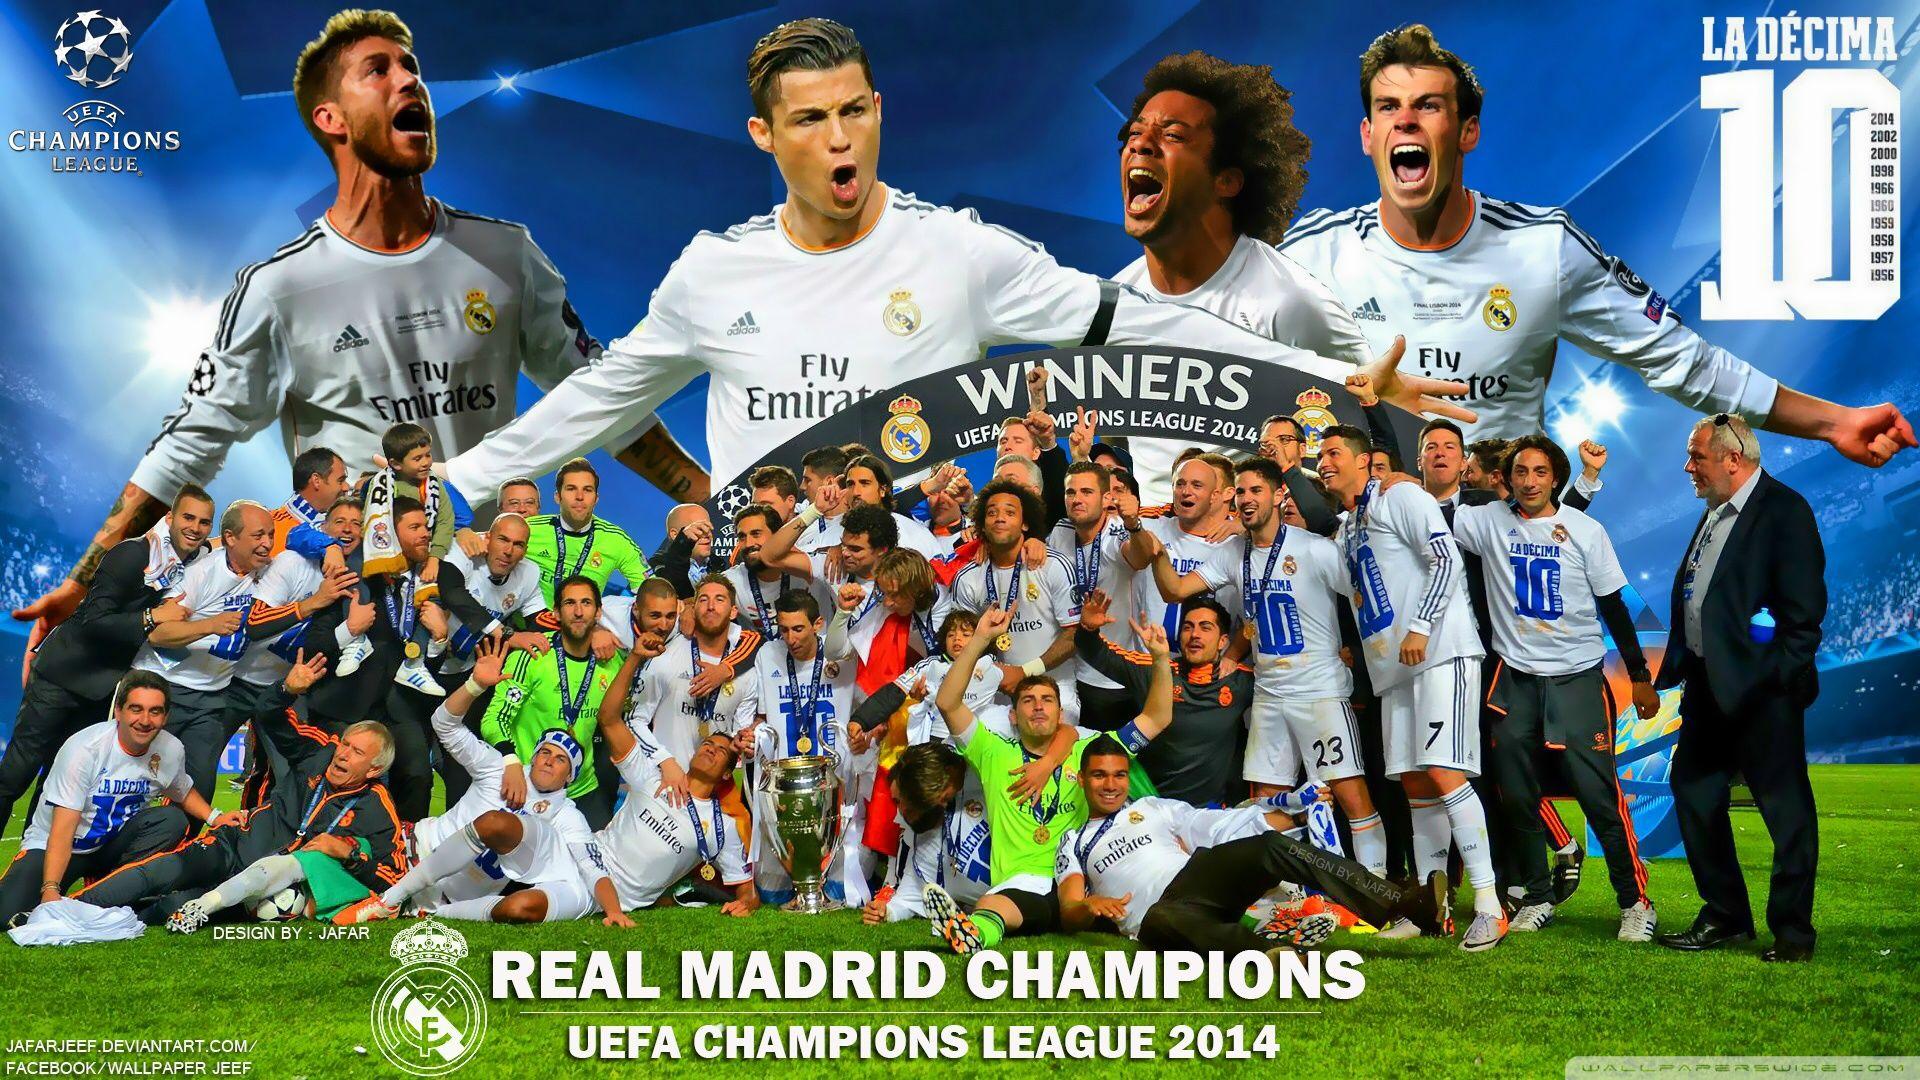 Real Madrid Winners Champions League 2014 HD Desktop